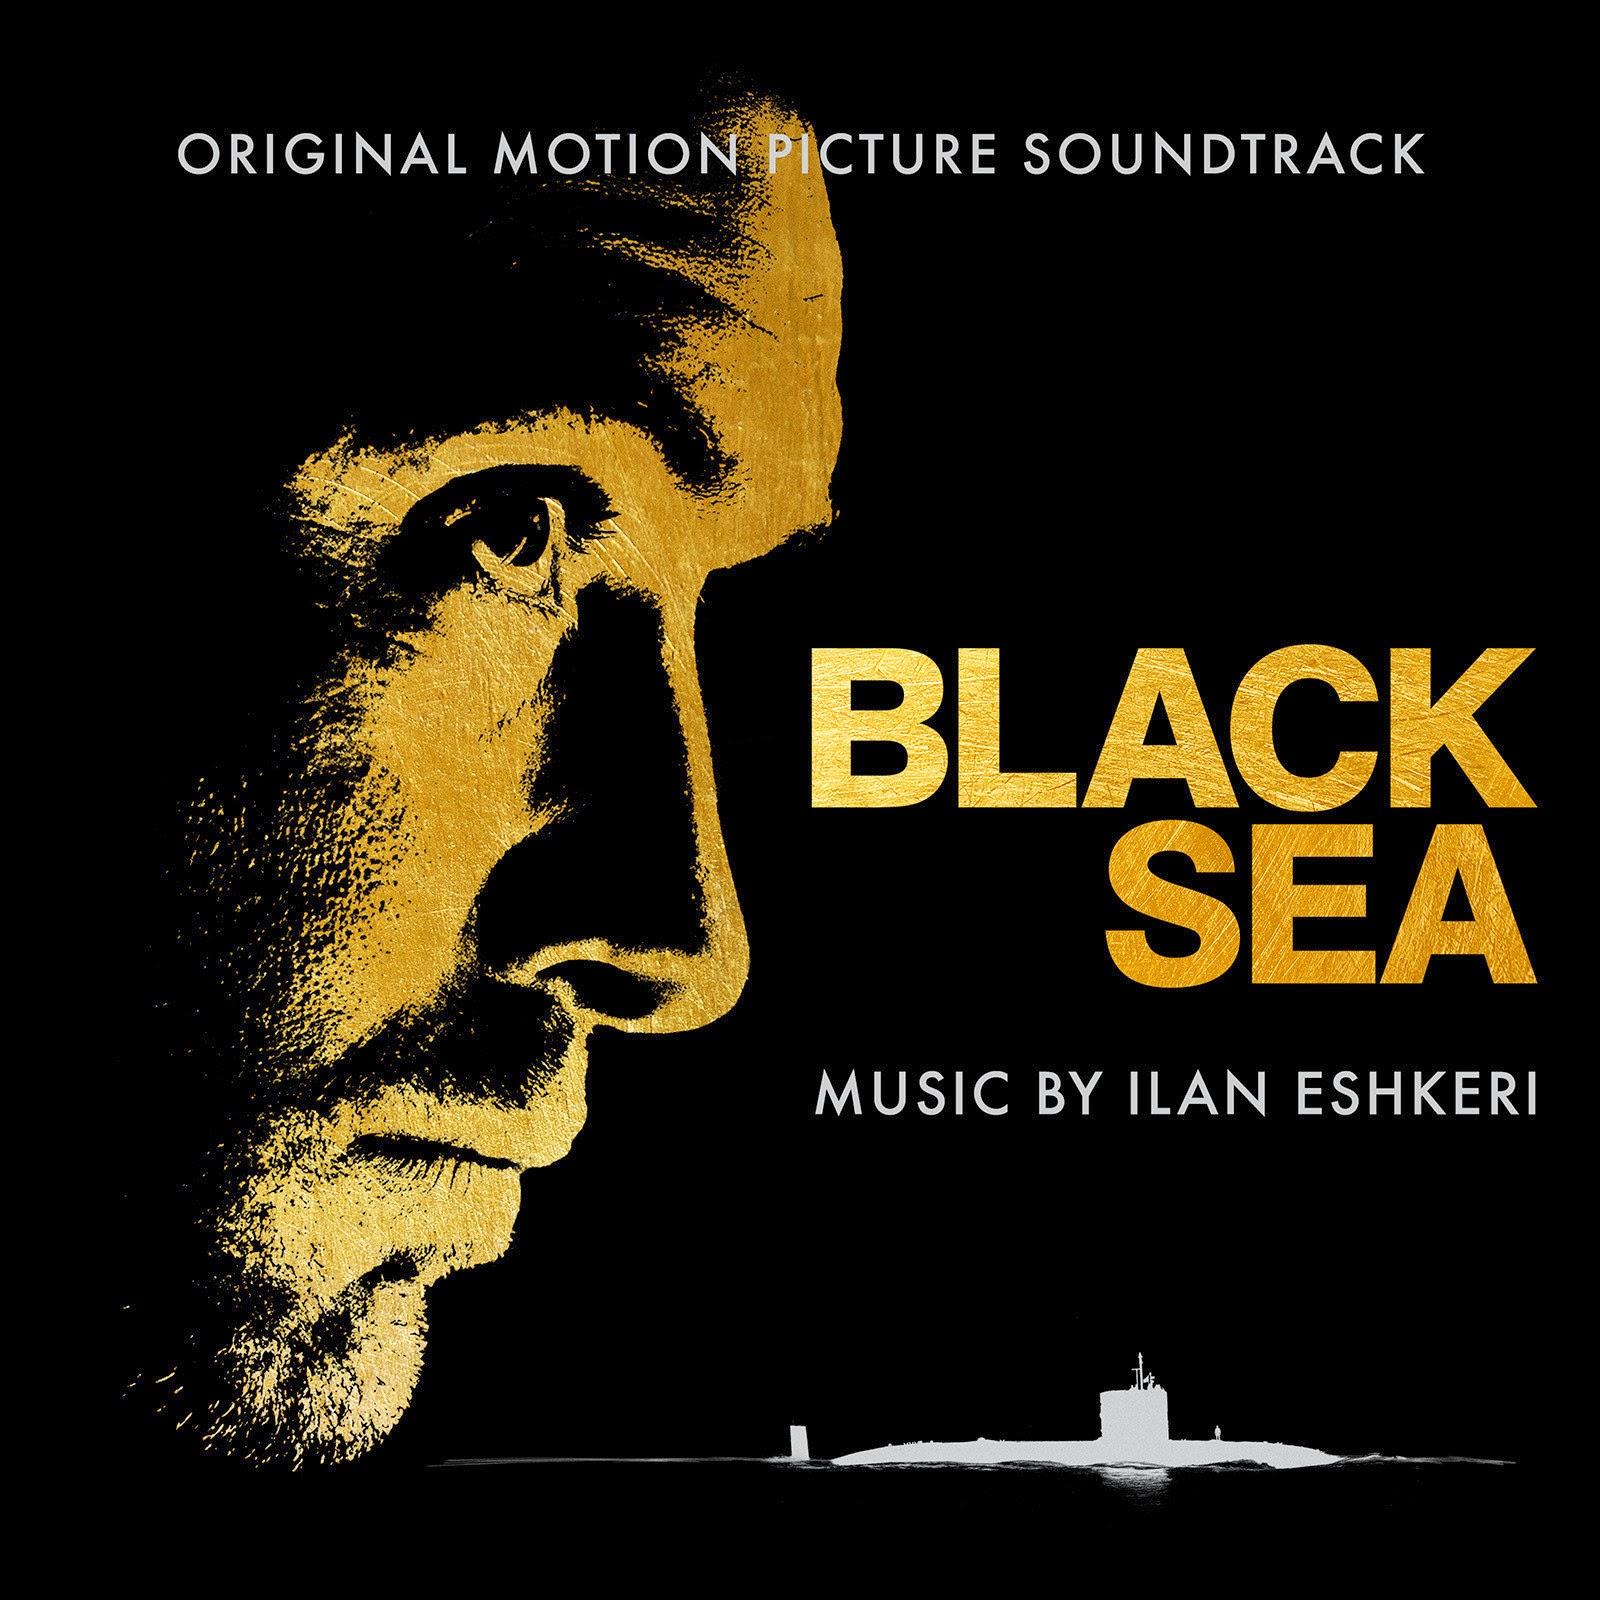 Movie Soundtrack Review: Black Sea - sandwichjohnfilms